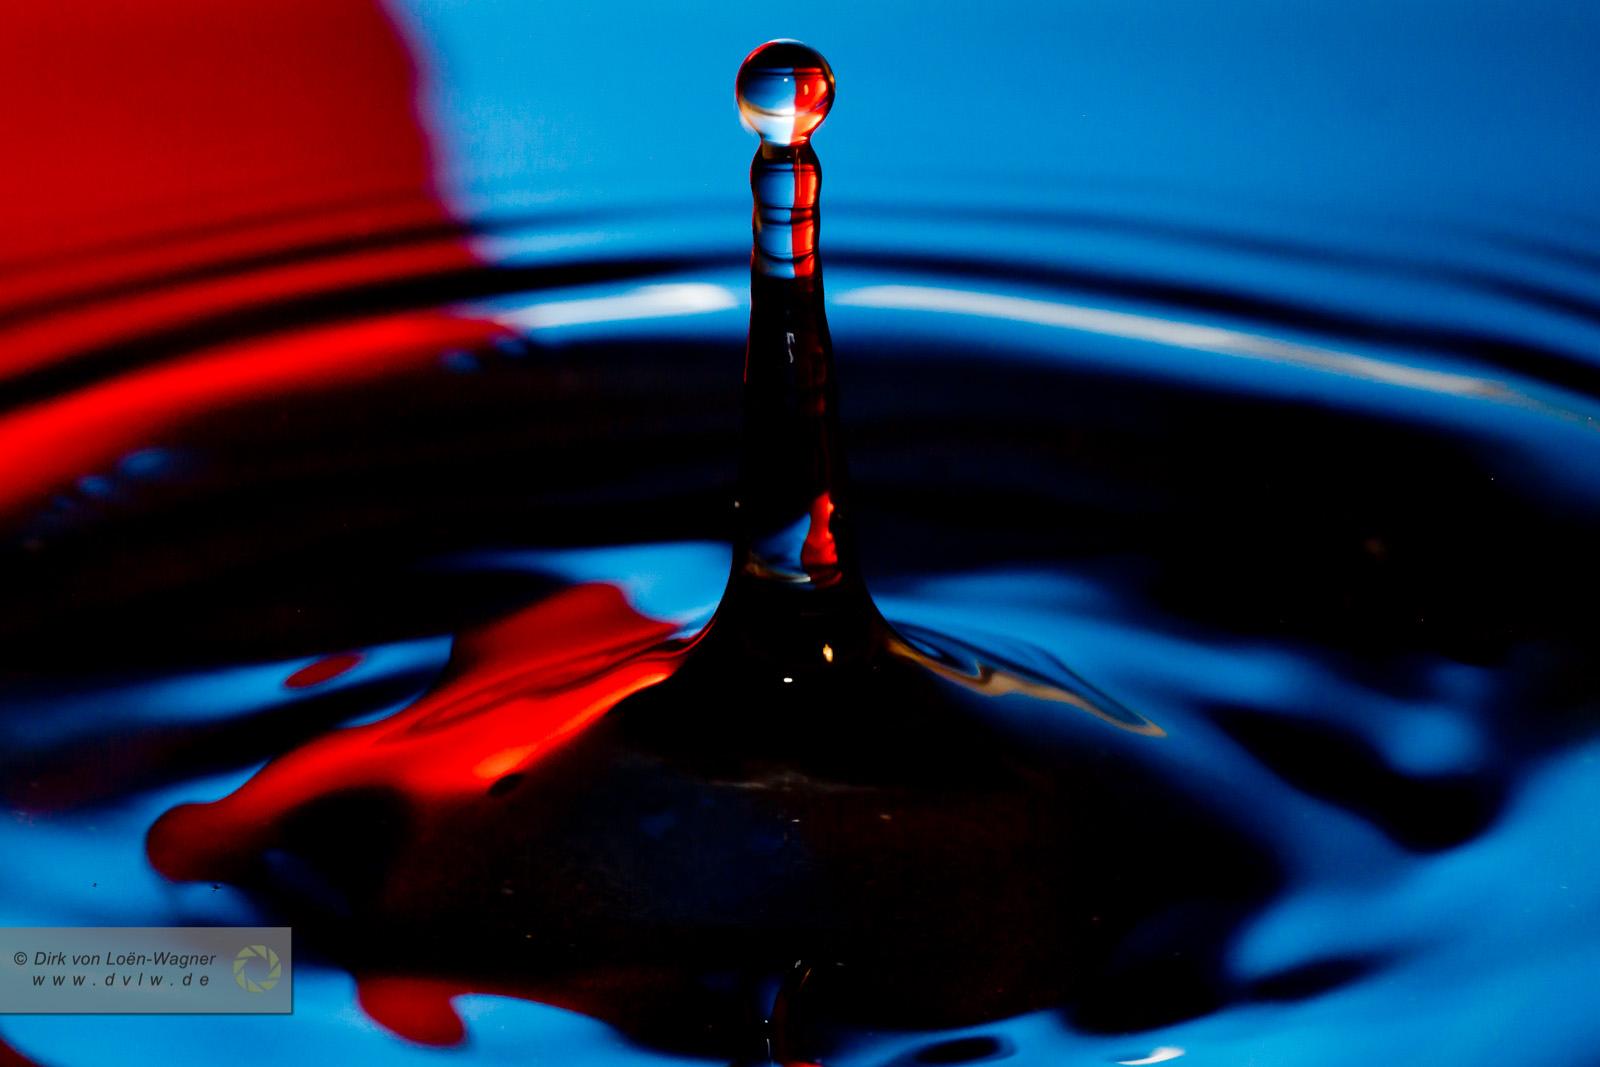 Splash 1 - Red & blue